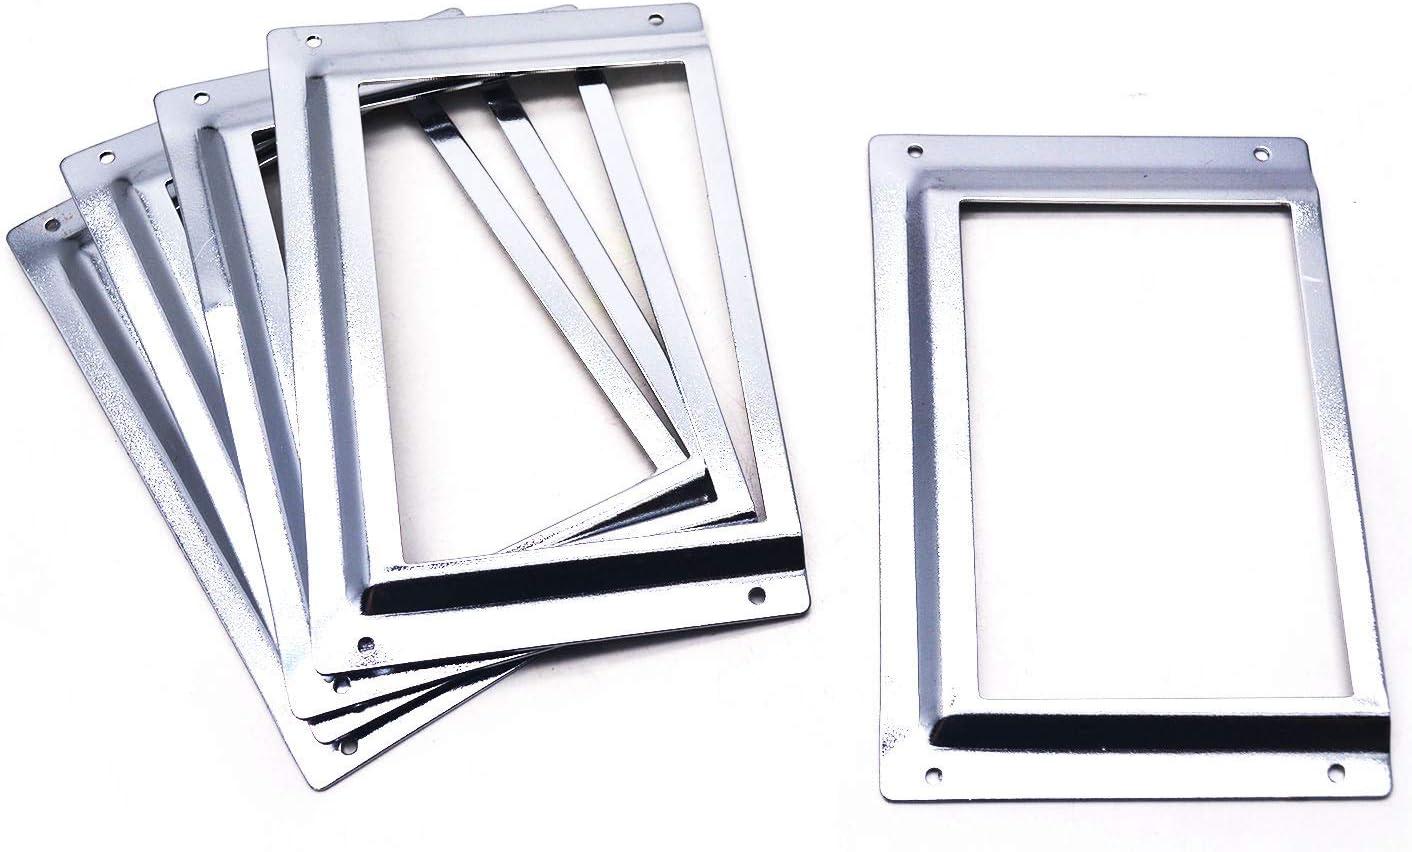 Tulead Drawer Lable Holders Iron Tag Holders File Label Frames Card Frame Holder Cabinet Name Plate Office File Shelves 5-Packs (114.6 x 75mm)